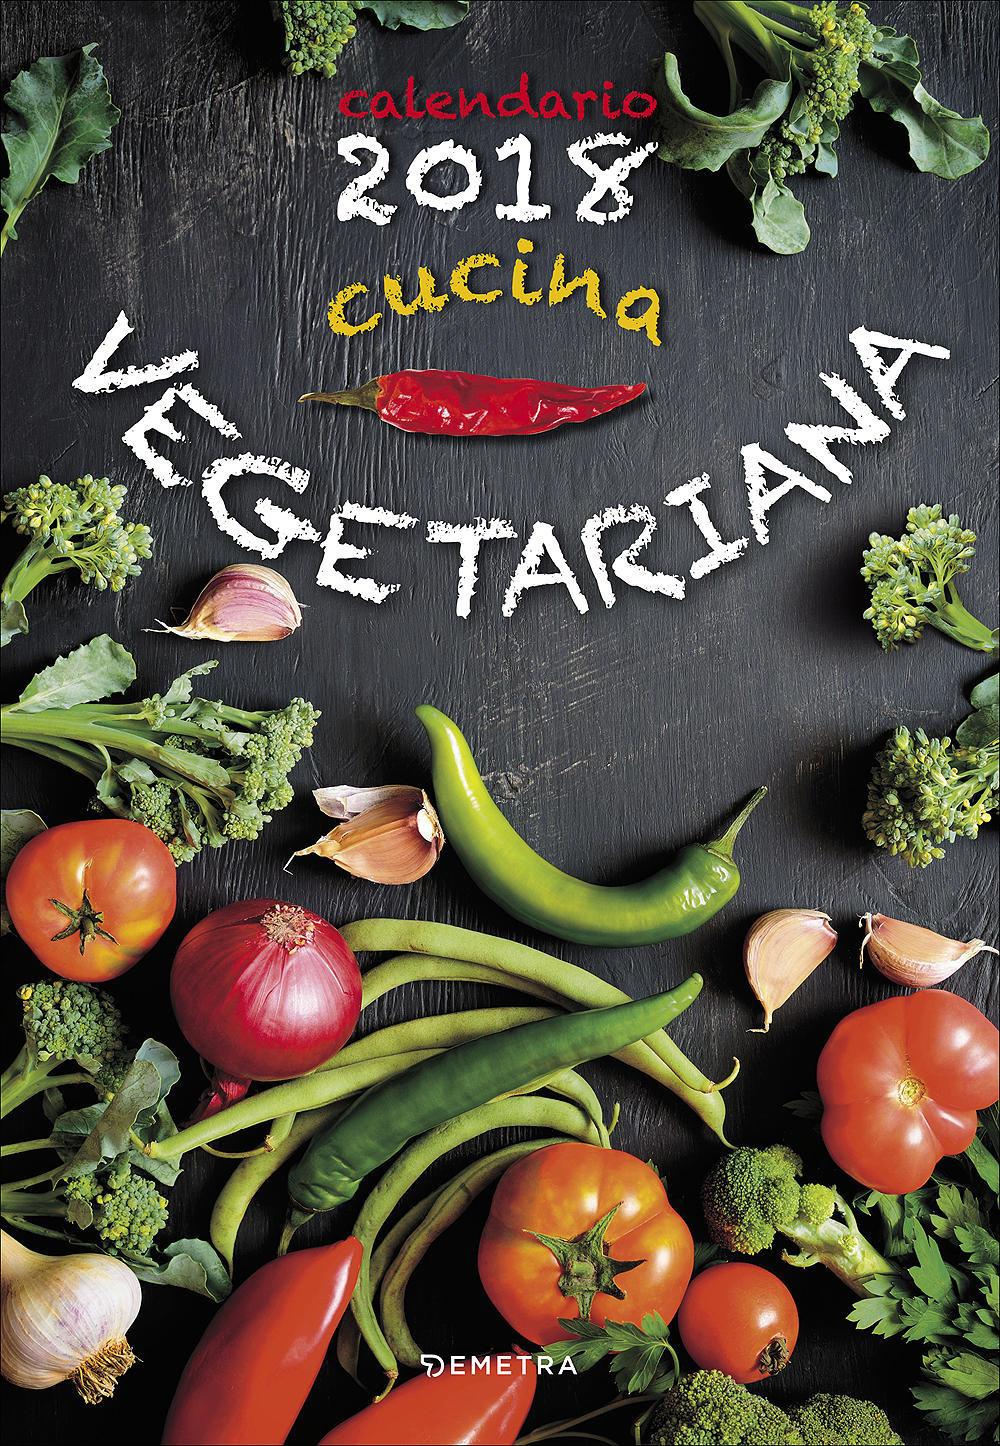 Cucina vegetariana. Calendario 2018